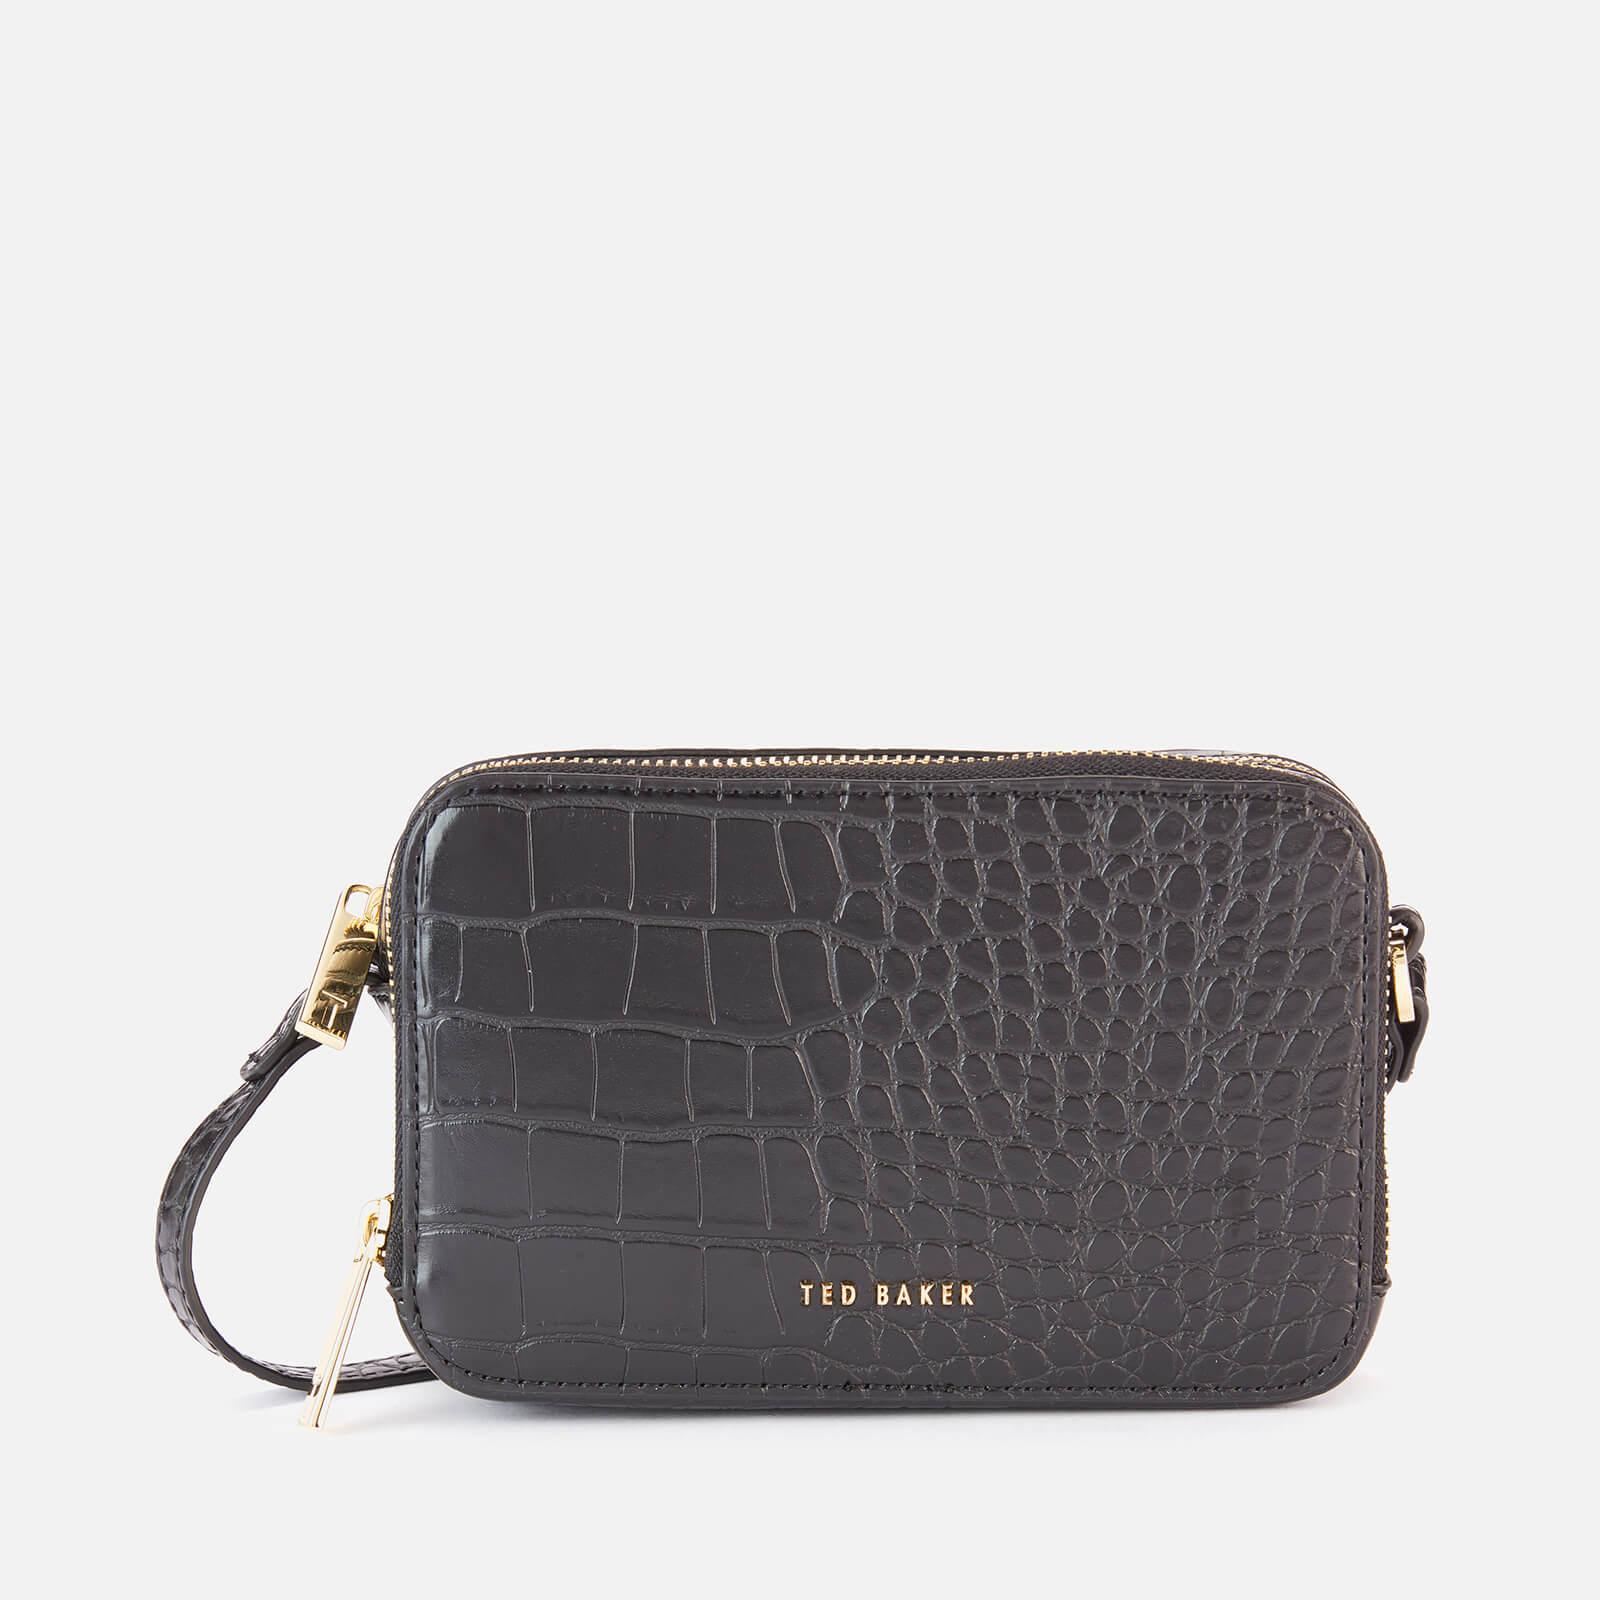 Ted Baker Women's Stina Double Zip Mini Camera Bag - Black